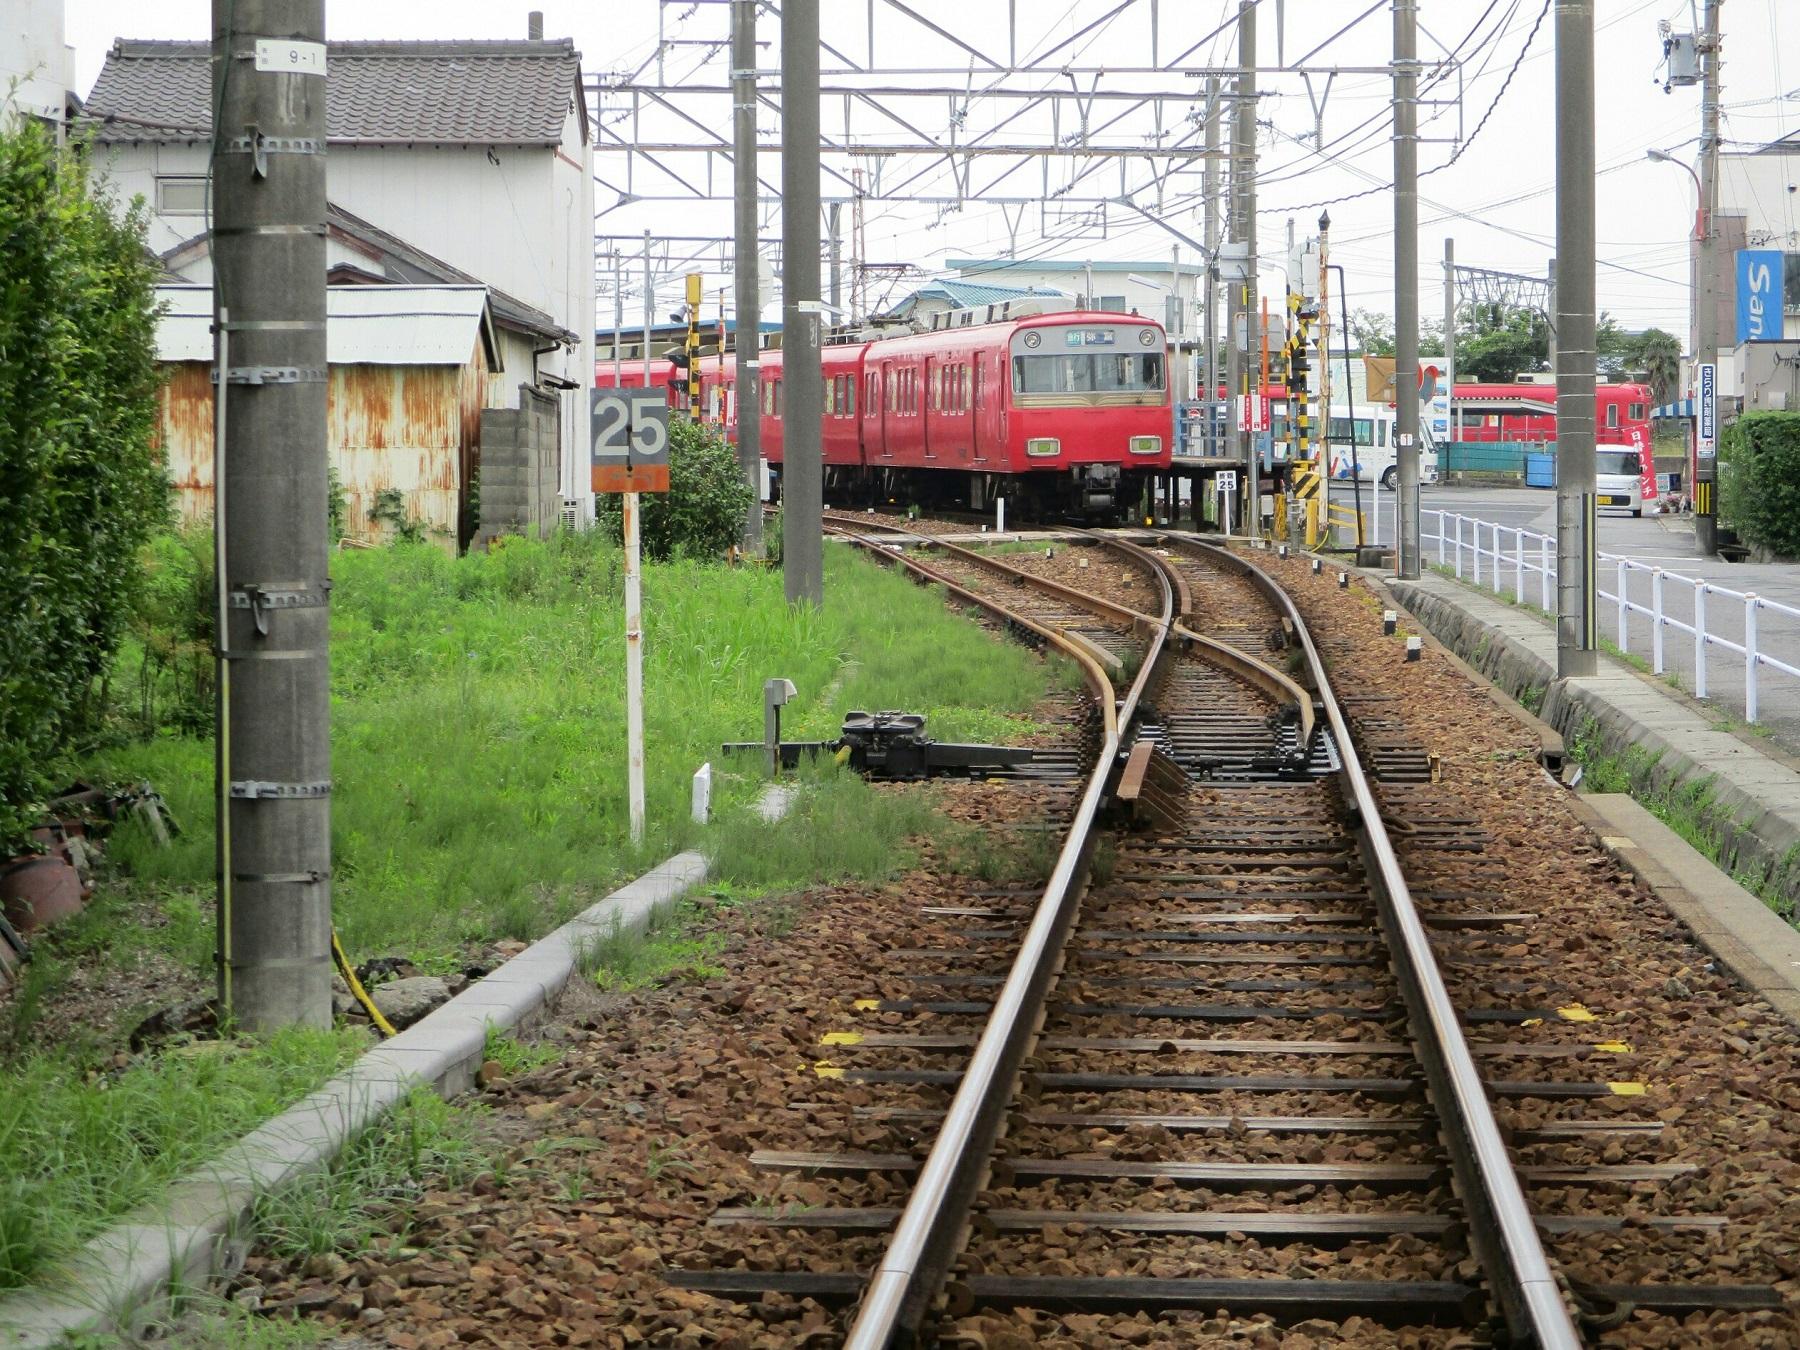 2018.6.15 吉良吉田 (7) 吉良吉田いき急行 1800-1350